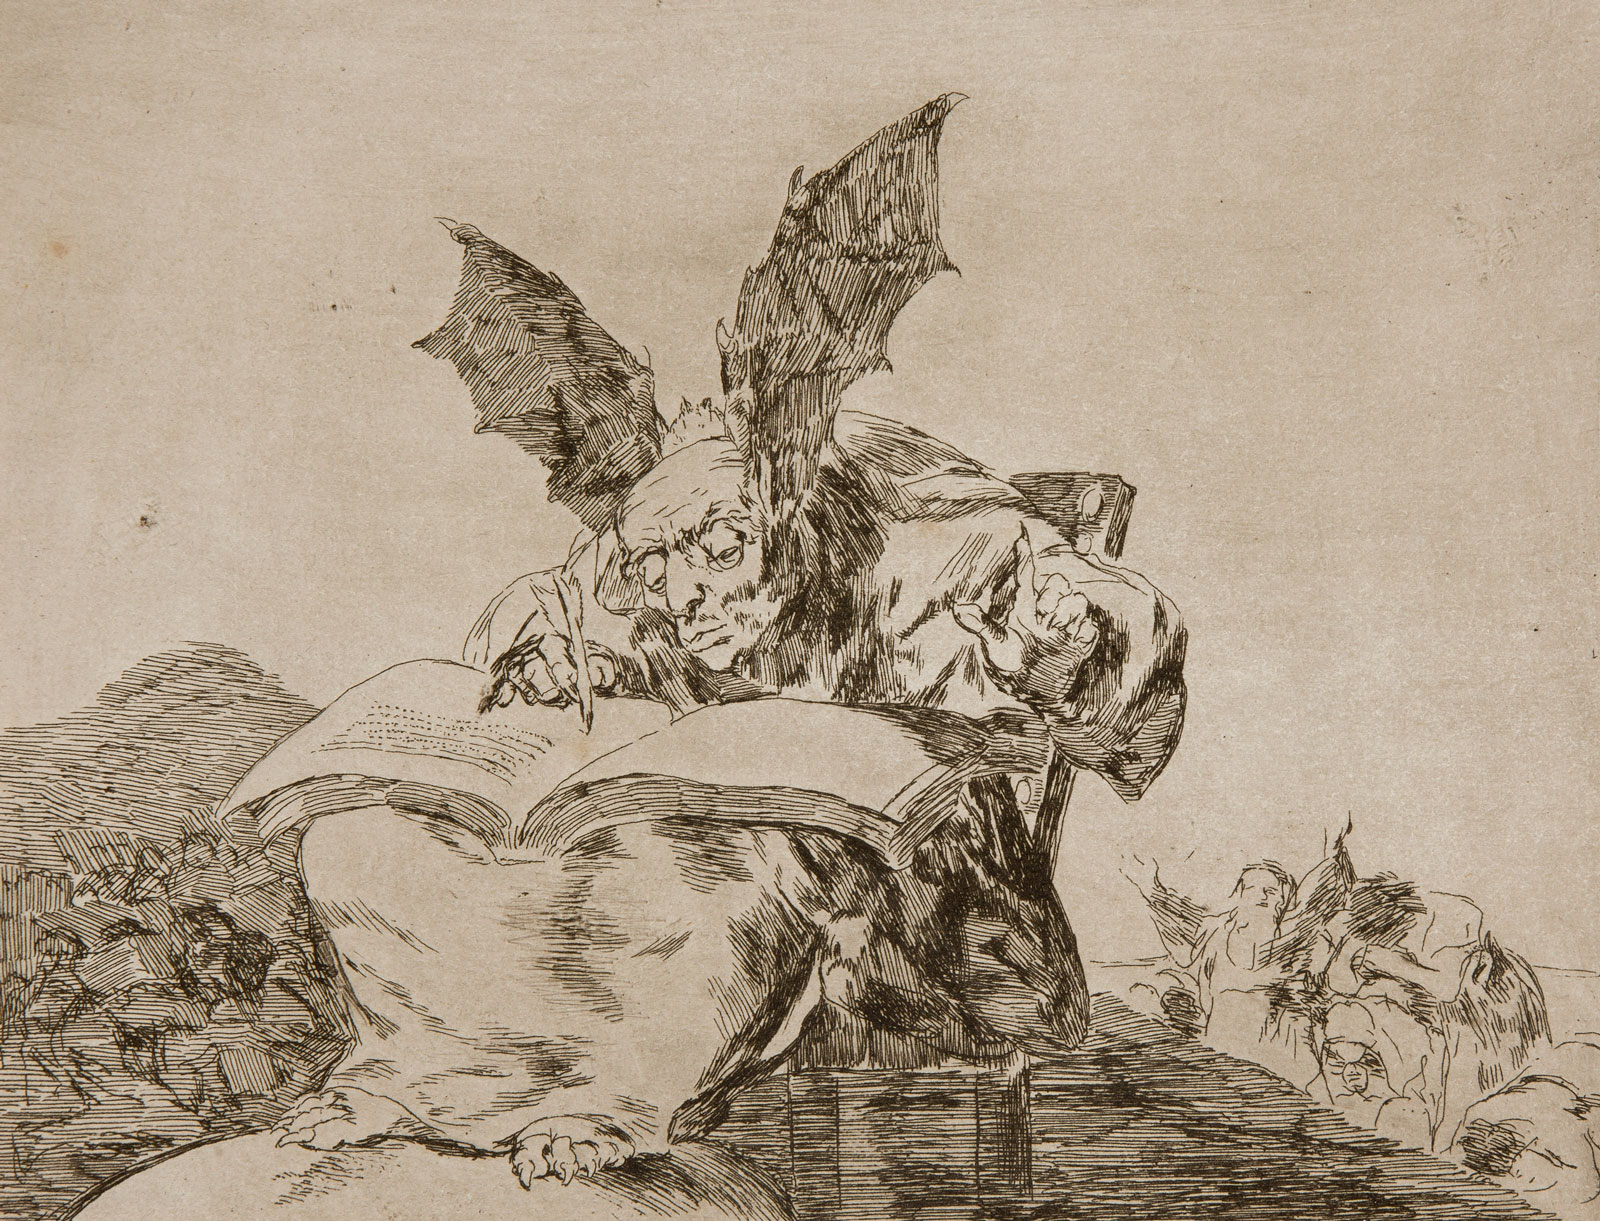 Francisco Goya: Against common good, 1810-1820